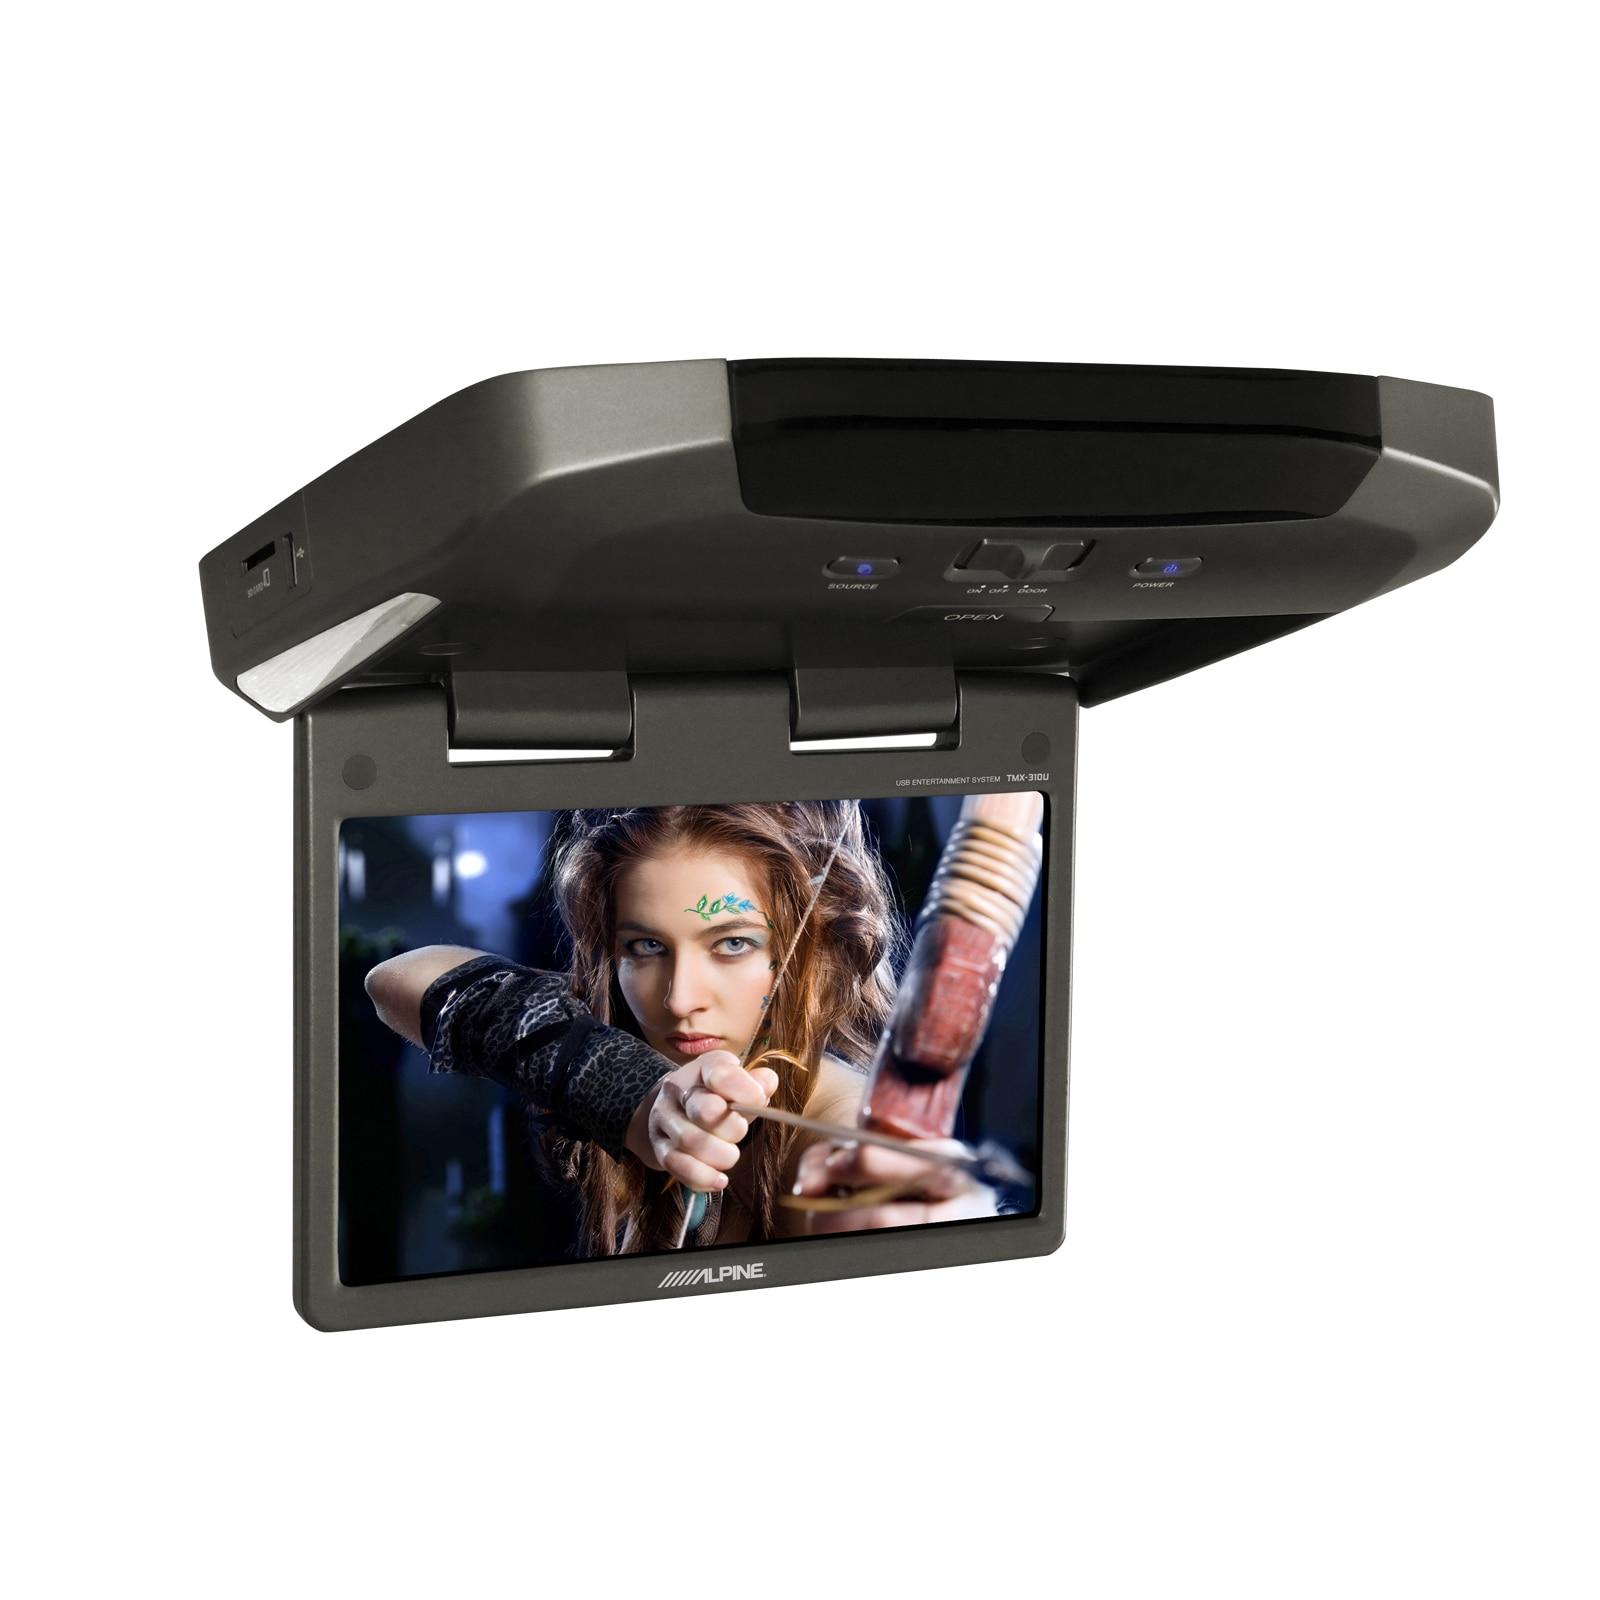 Fotografie Monitor auto plafoniera Alpine, HD, USB media player, slot SD, 2 x AUX AV inputs, redare MP3/WMA/AAC,Xvid, Wireless Remote Control,